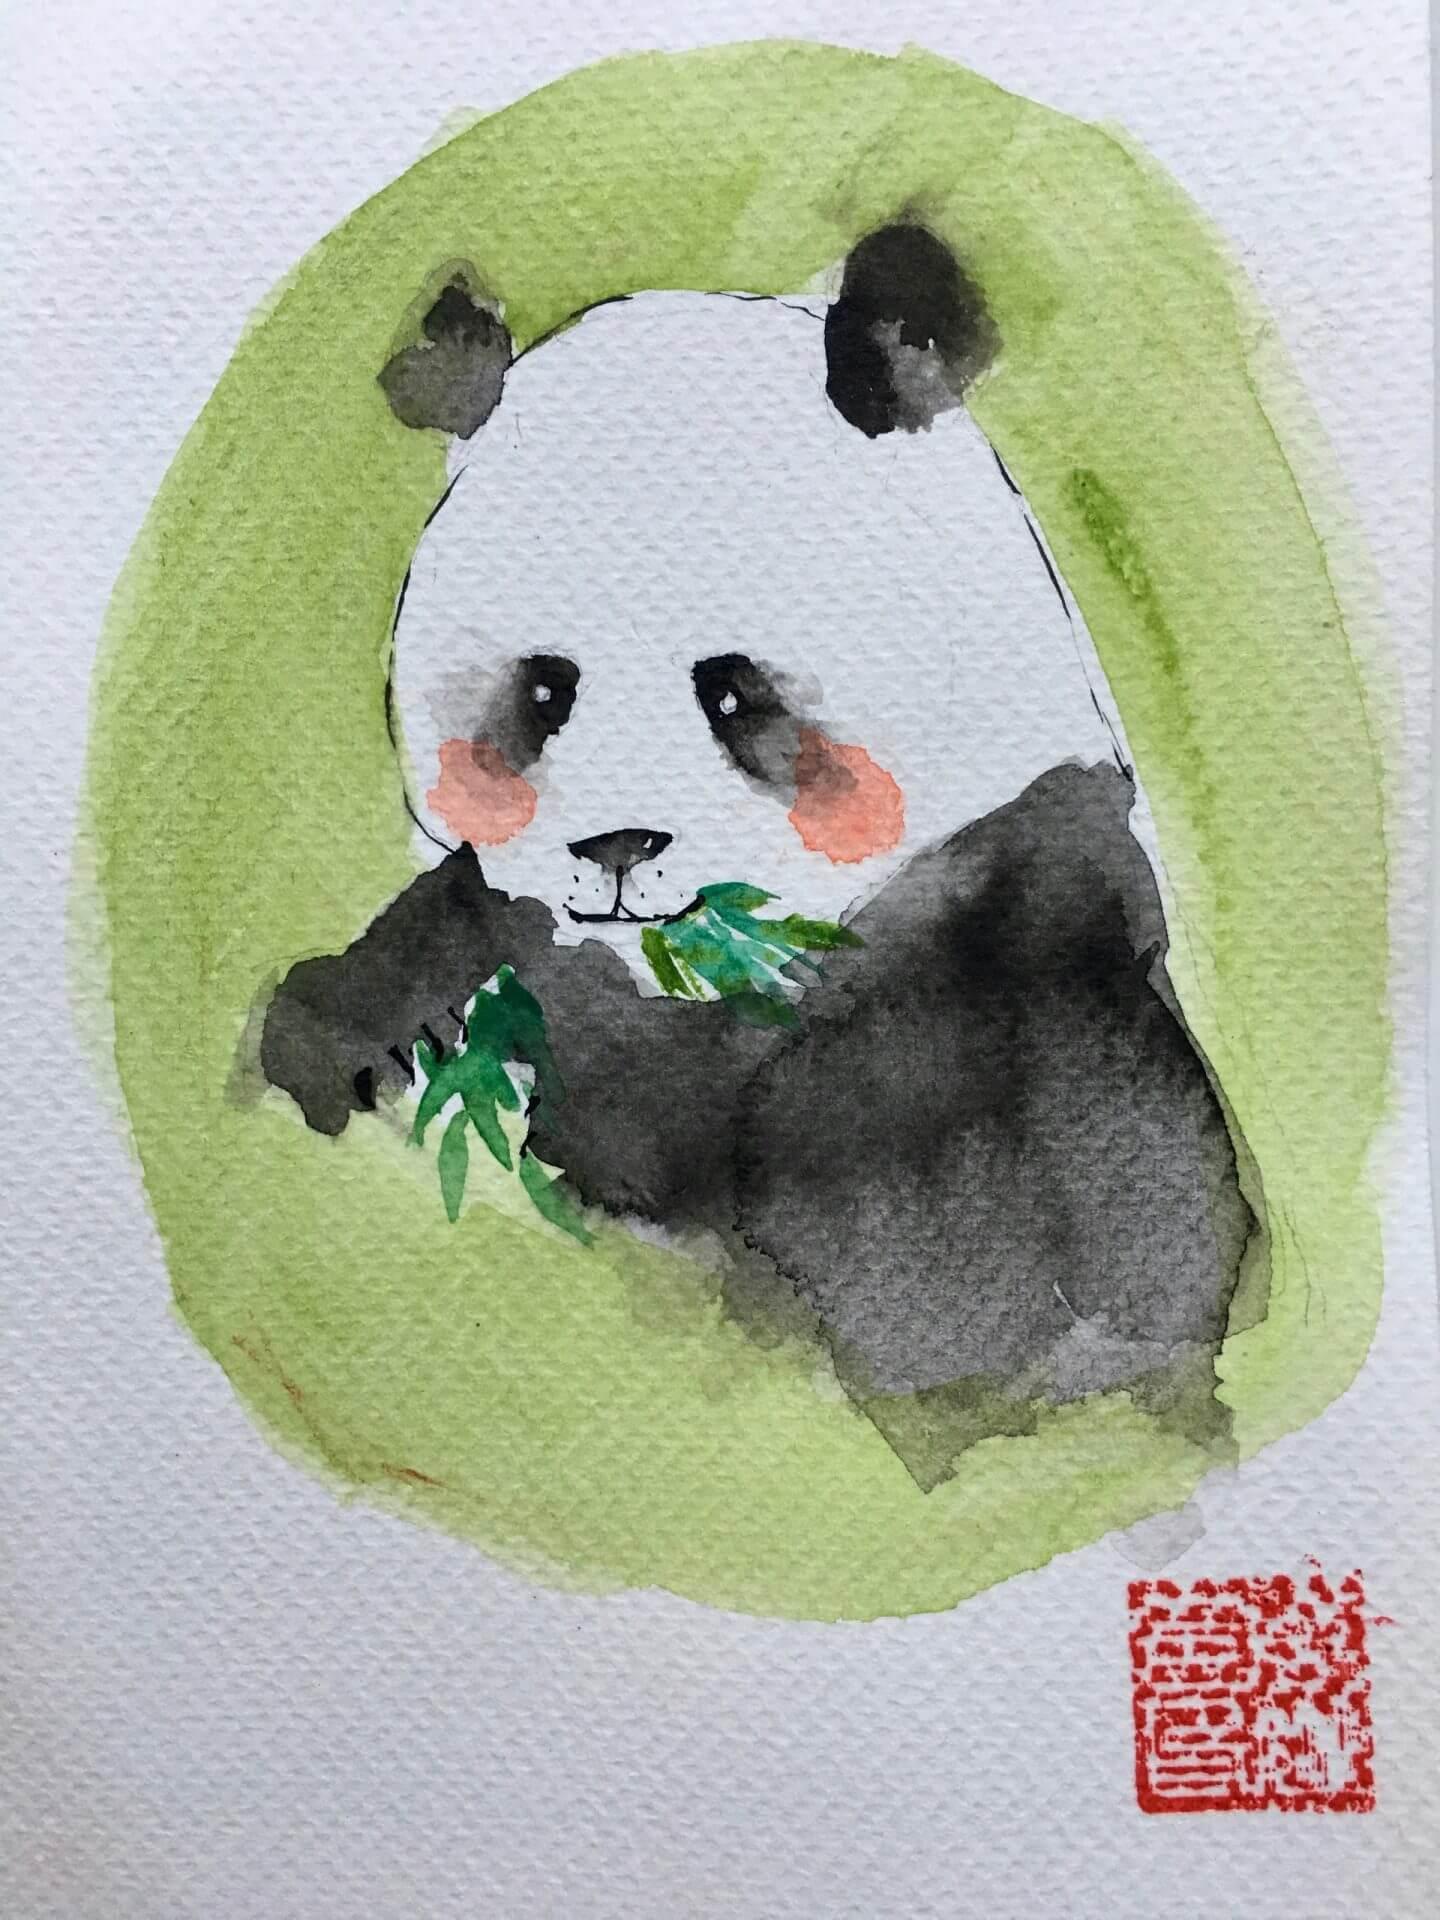 Chinese cute pandas and Mrs. Santa Claus